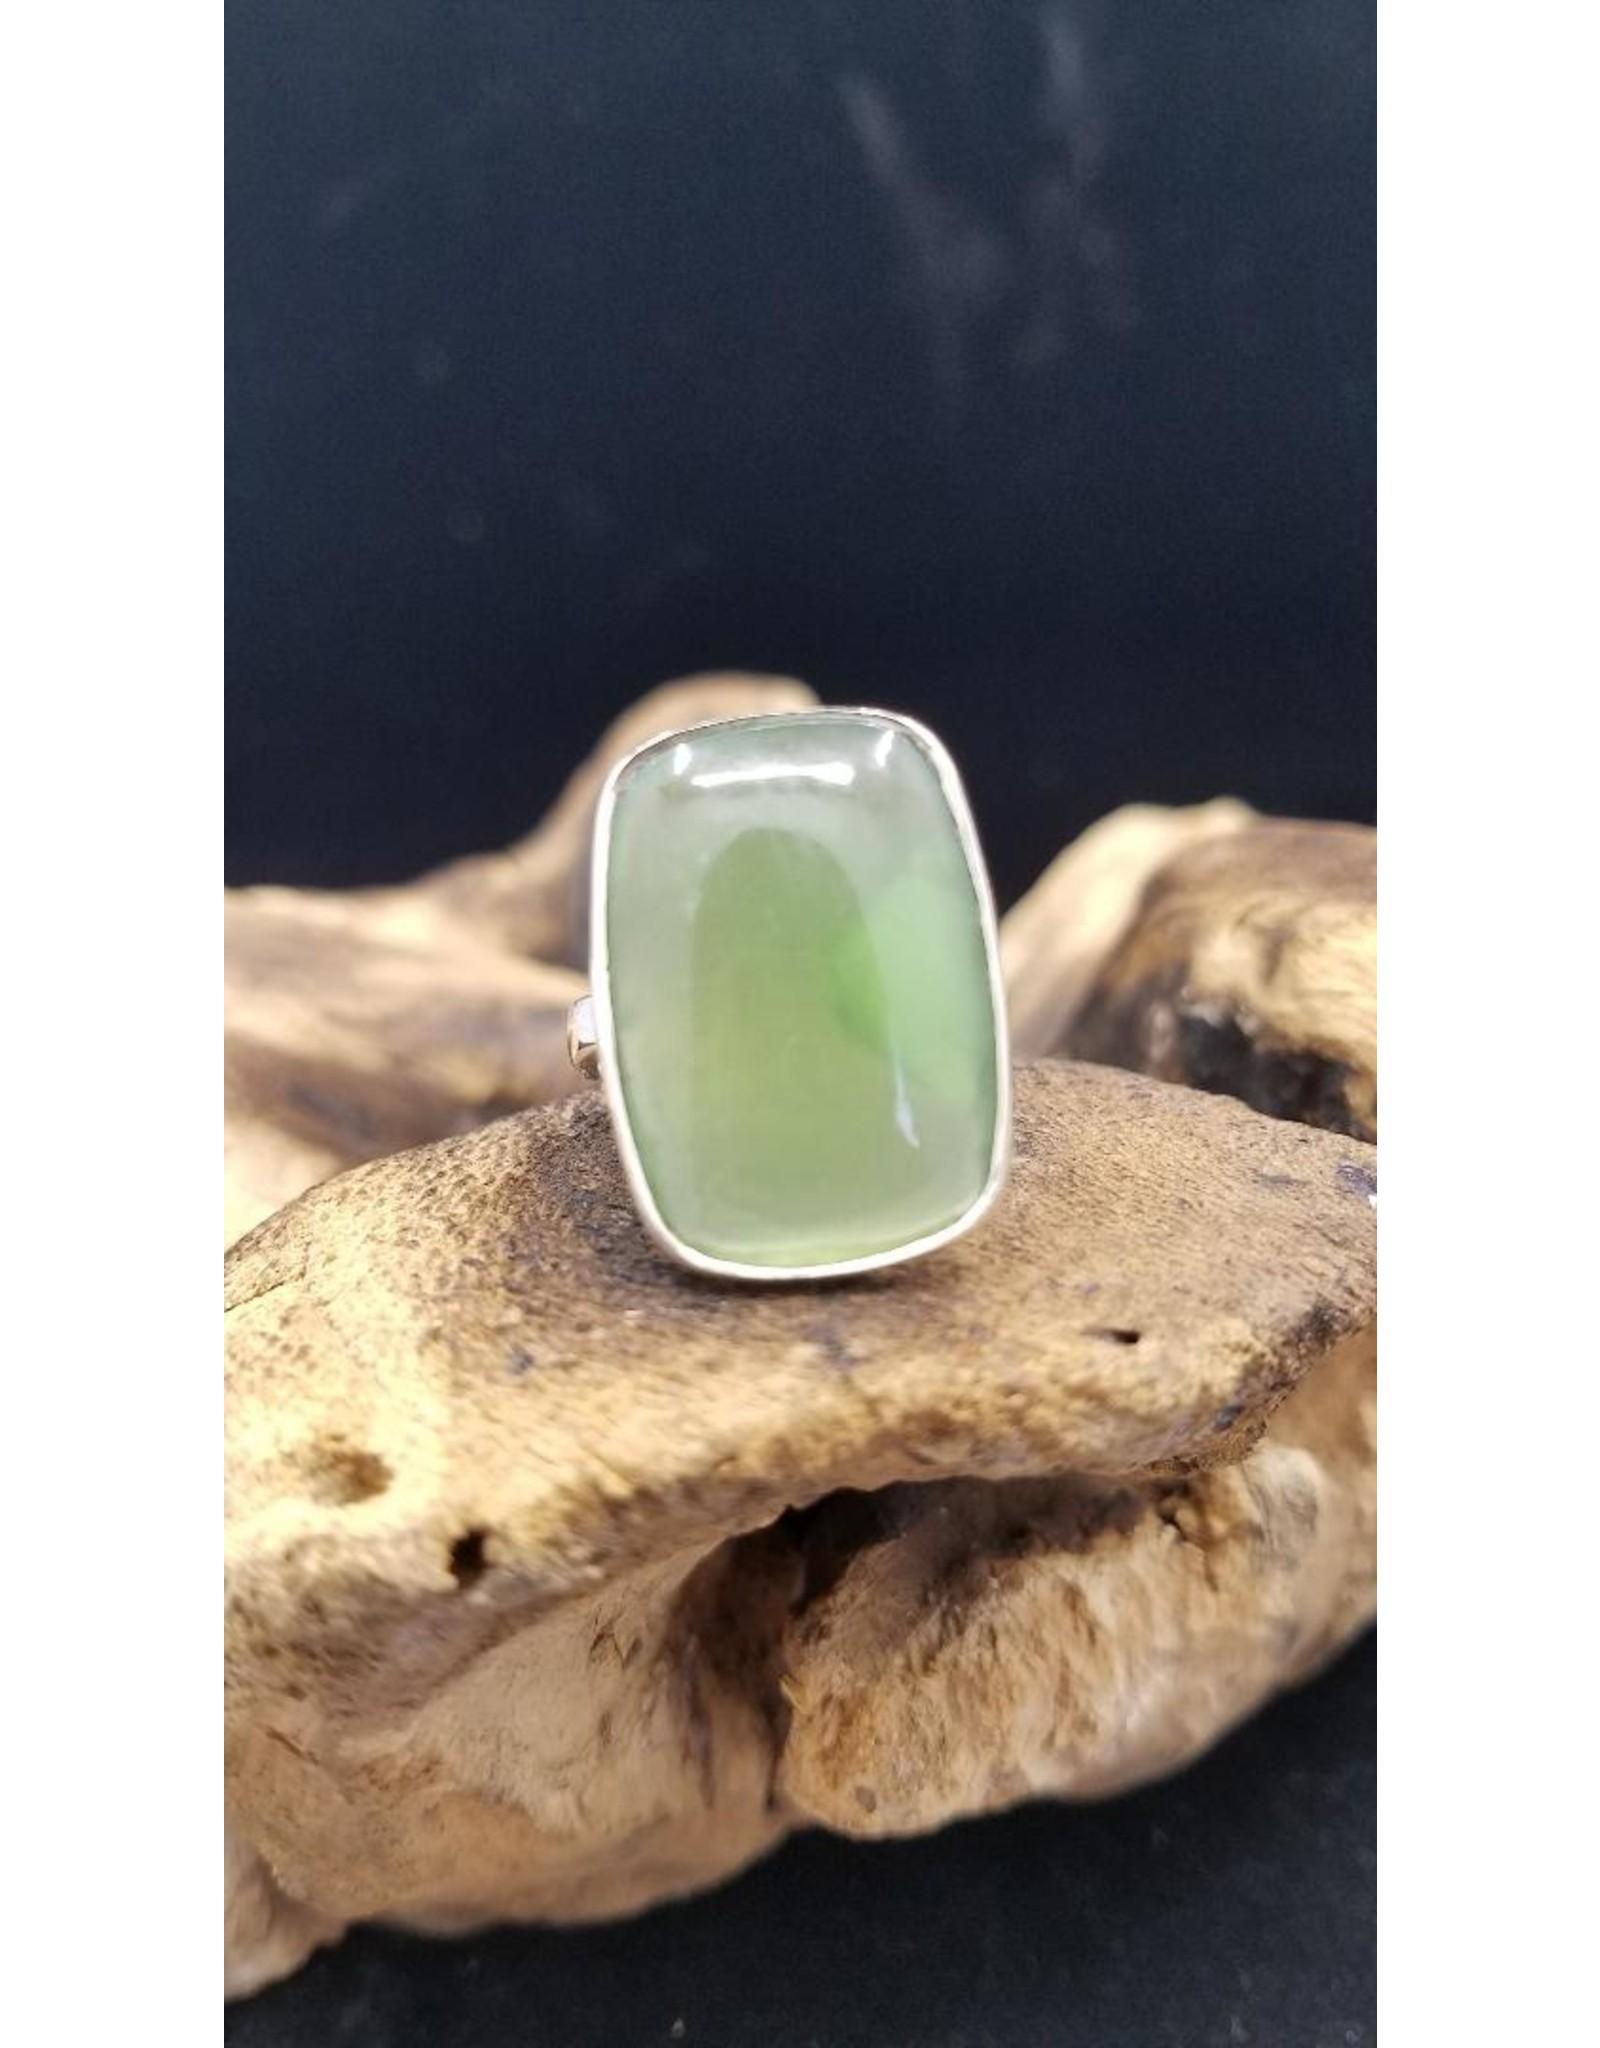 Nephrite Jade Ring 3 - Adjustable